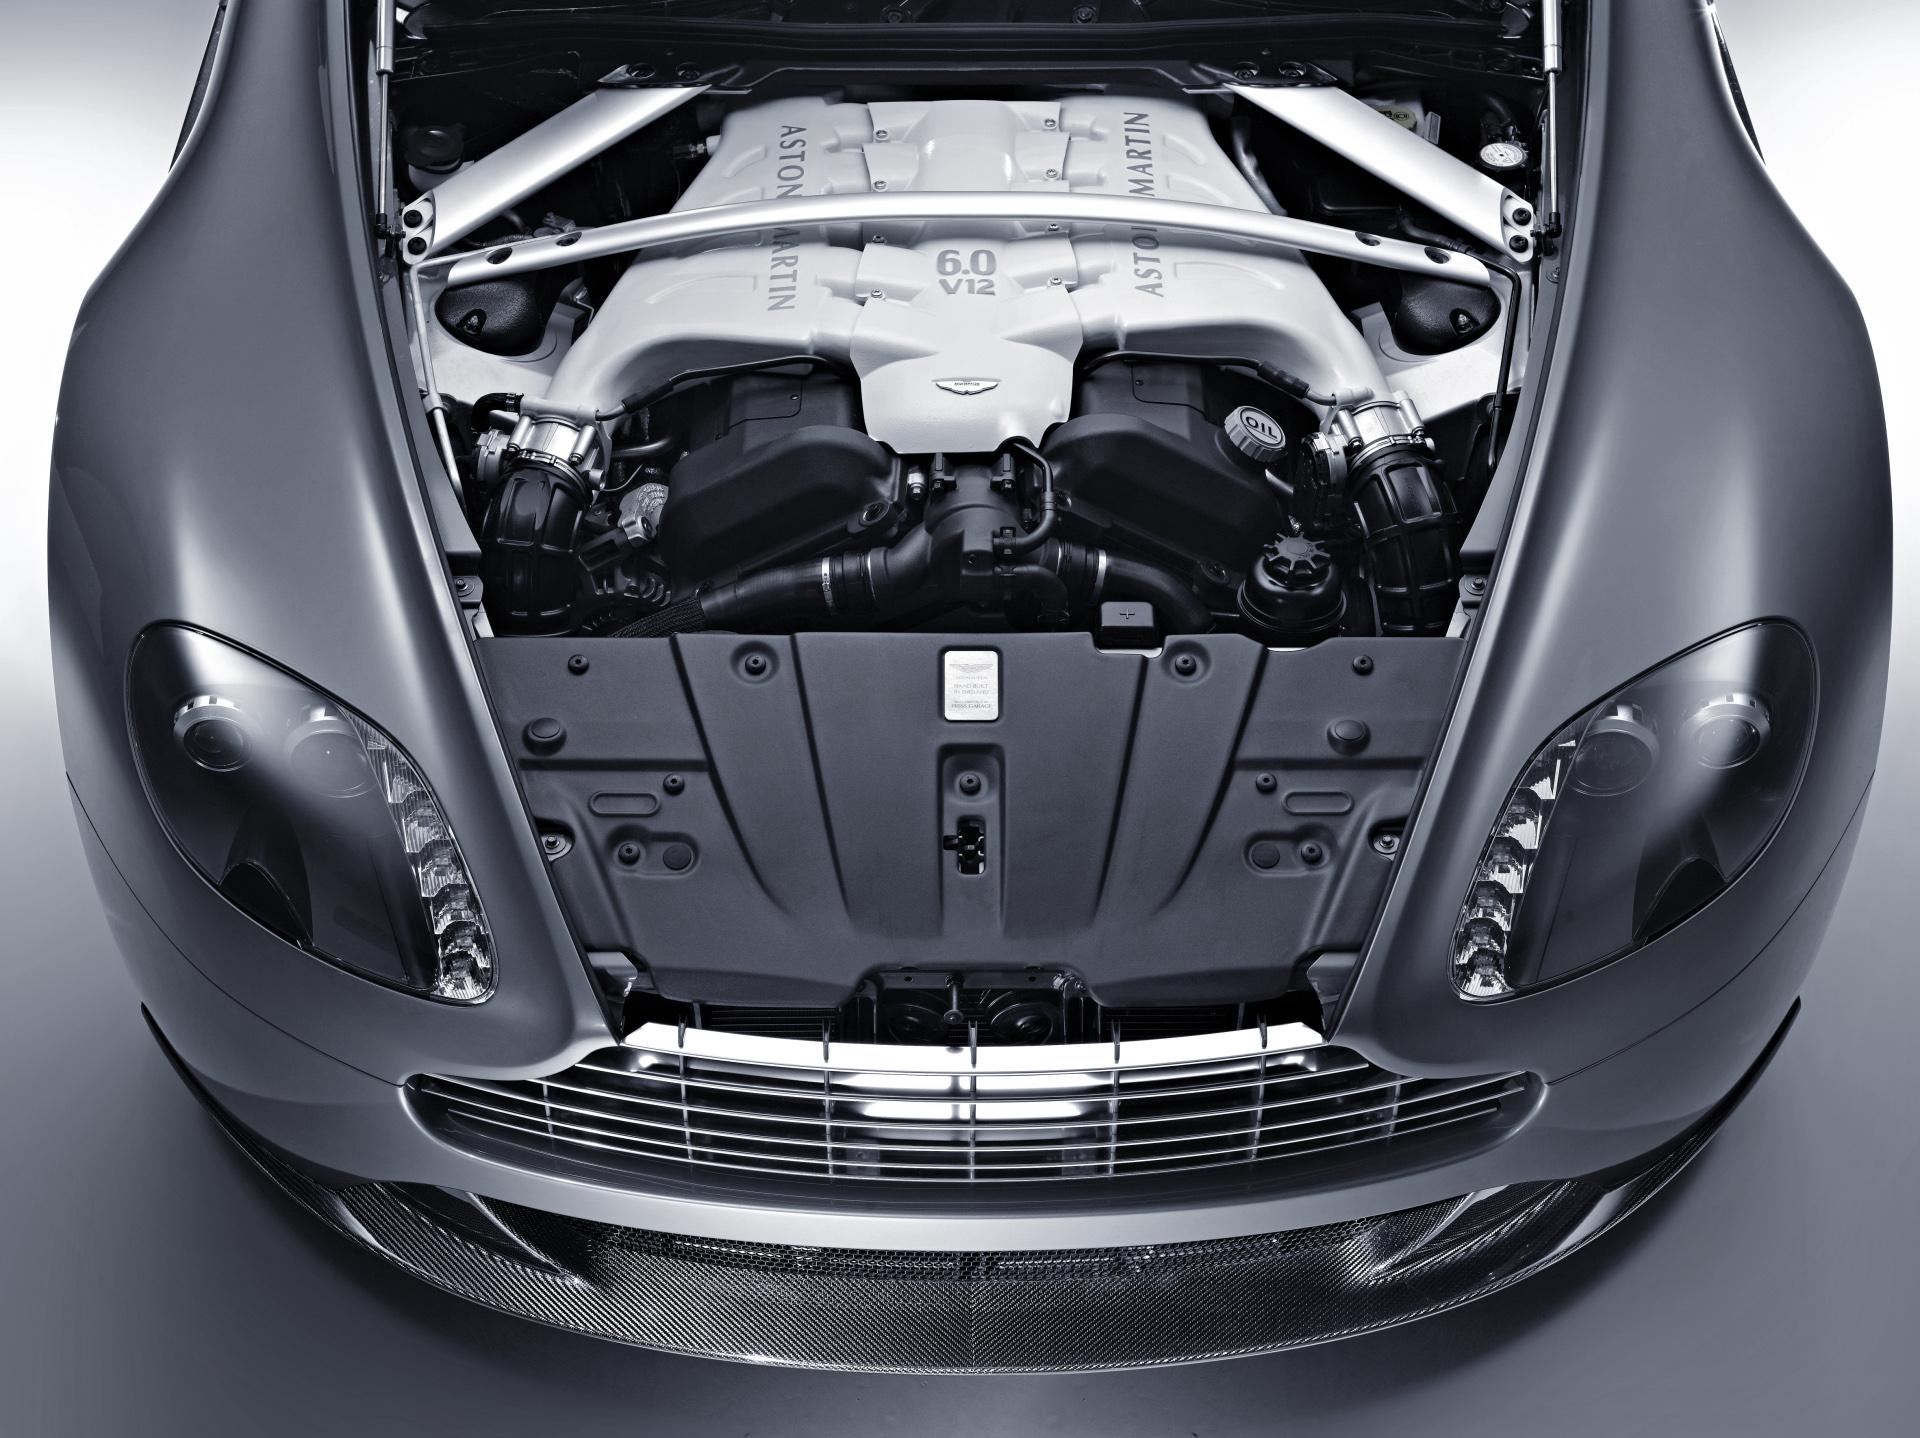 Aston Martin V12 Vantage Price India Aston Martin V12 Vantage 0 100